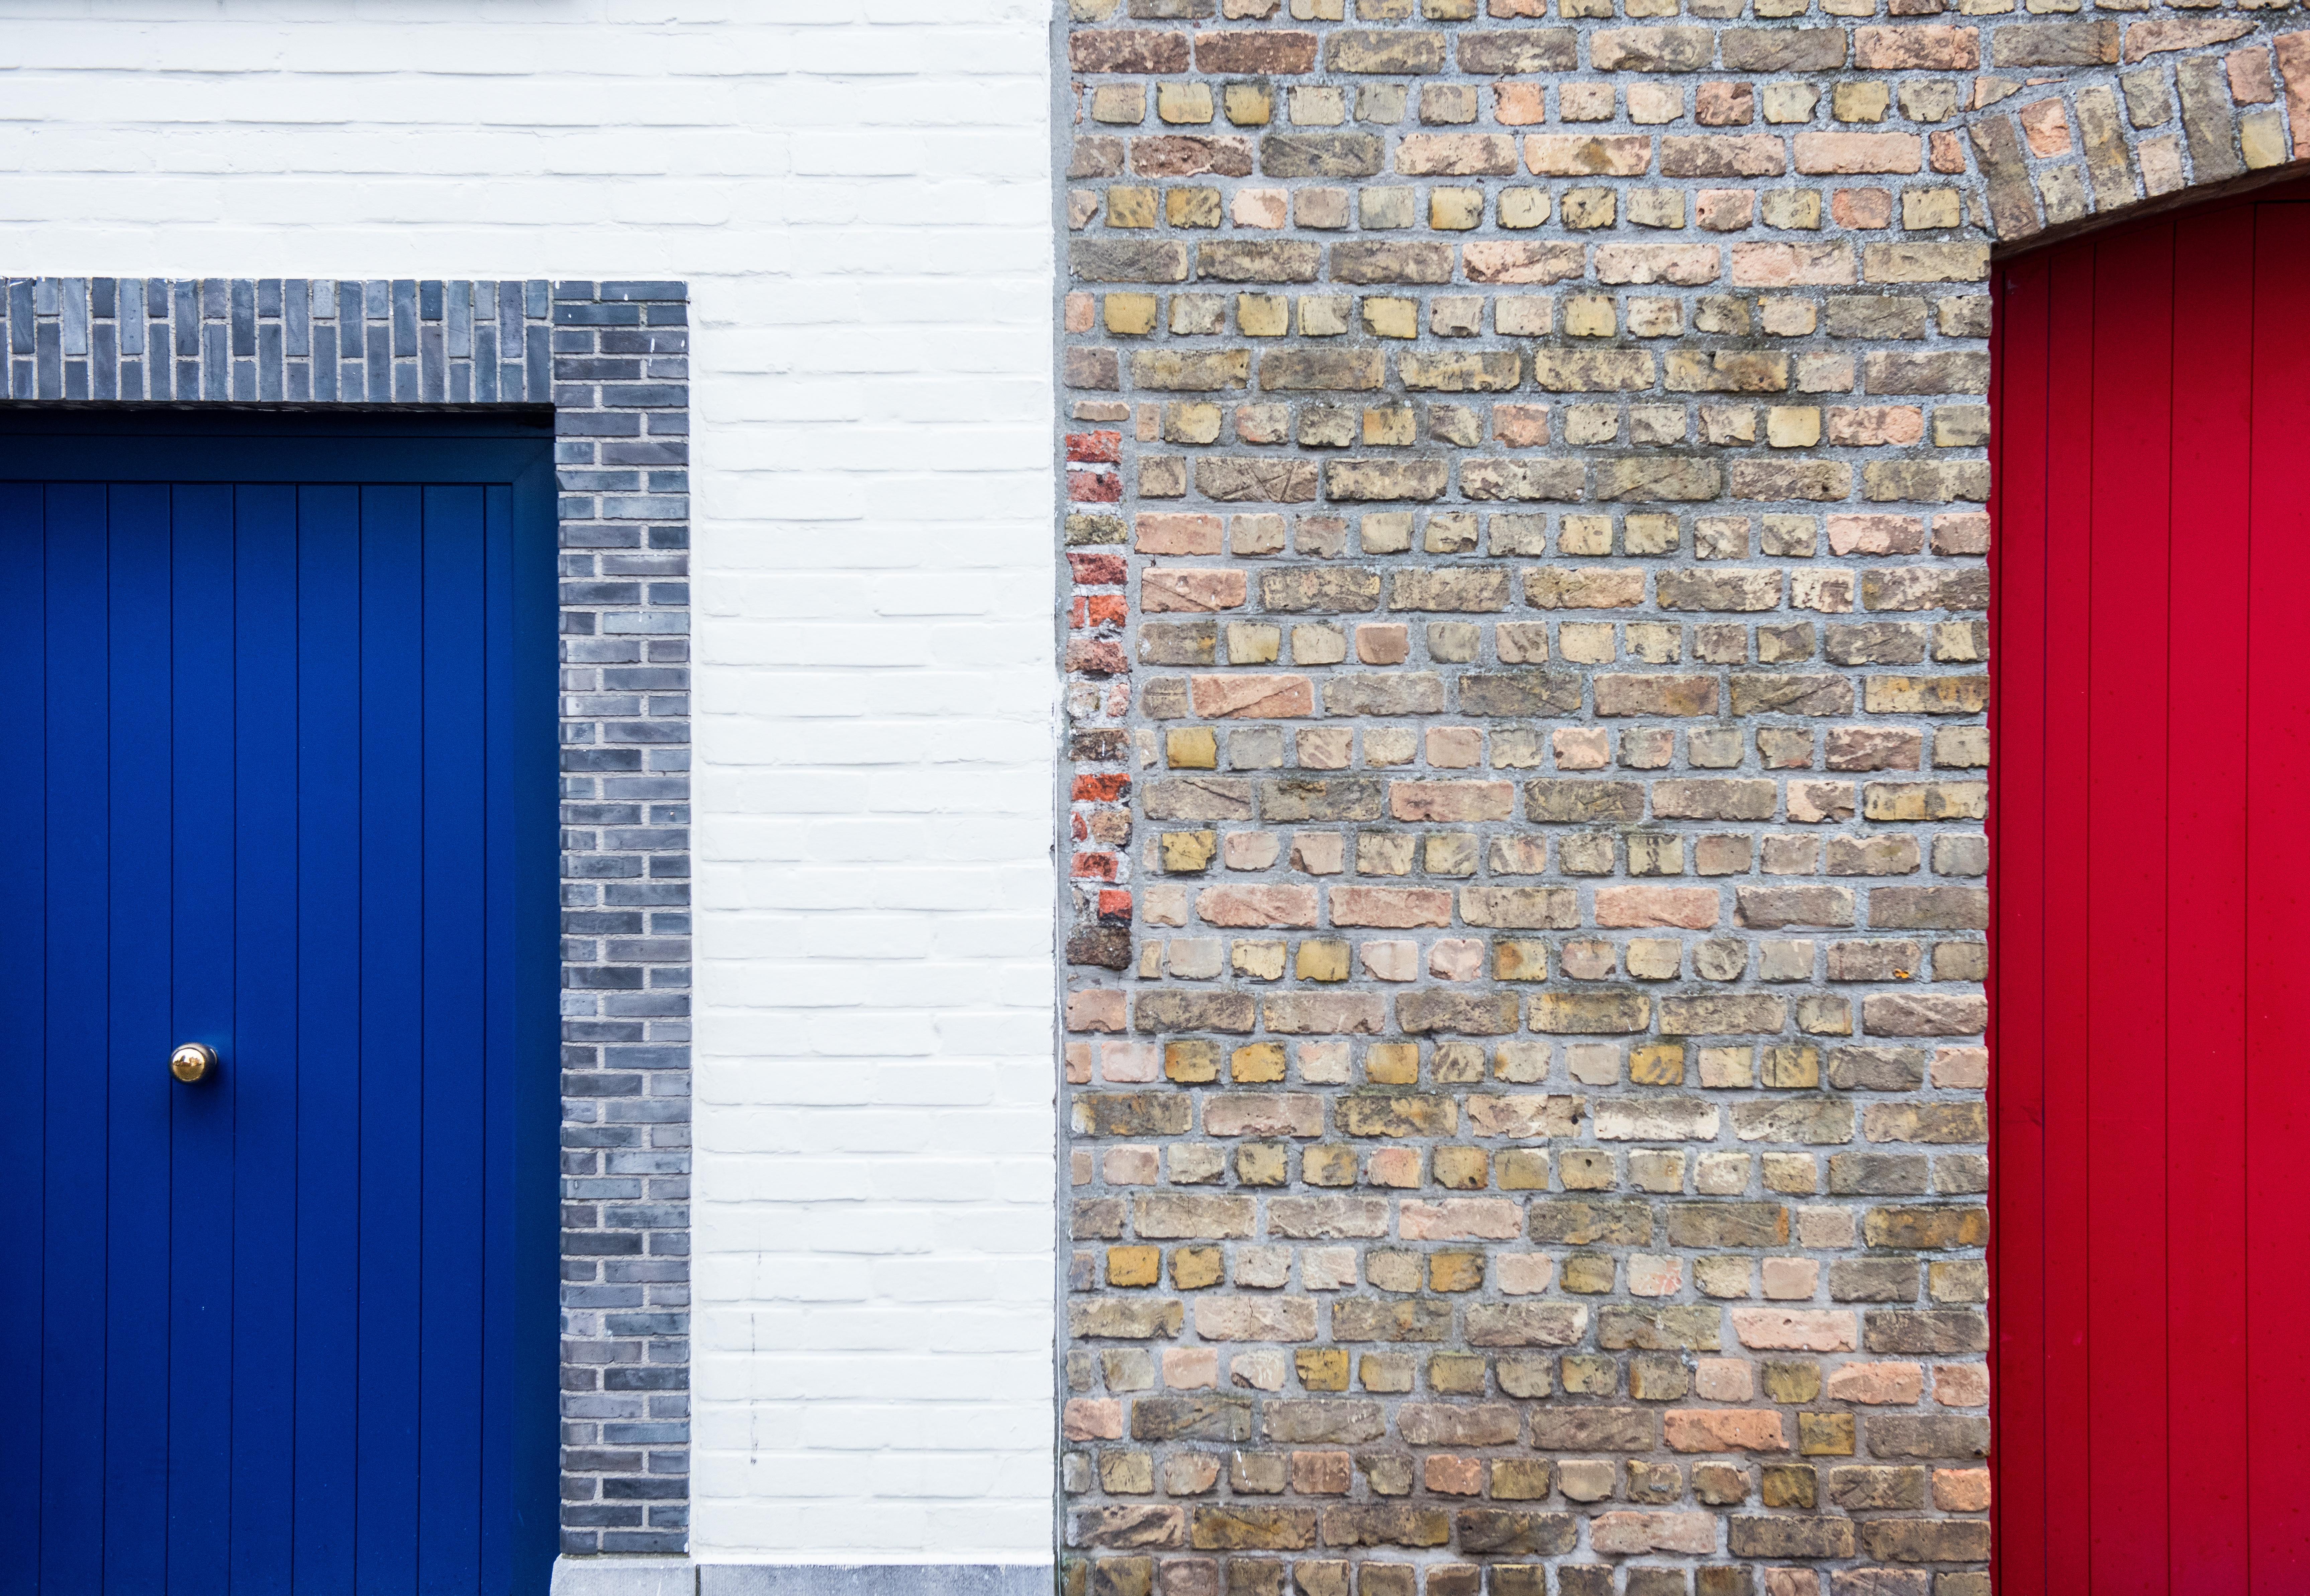 Architecture Wood House Window Wall Facade Blue Brick Door Material Interior  Design Brickwork Siding Window Covering